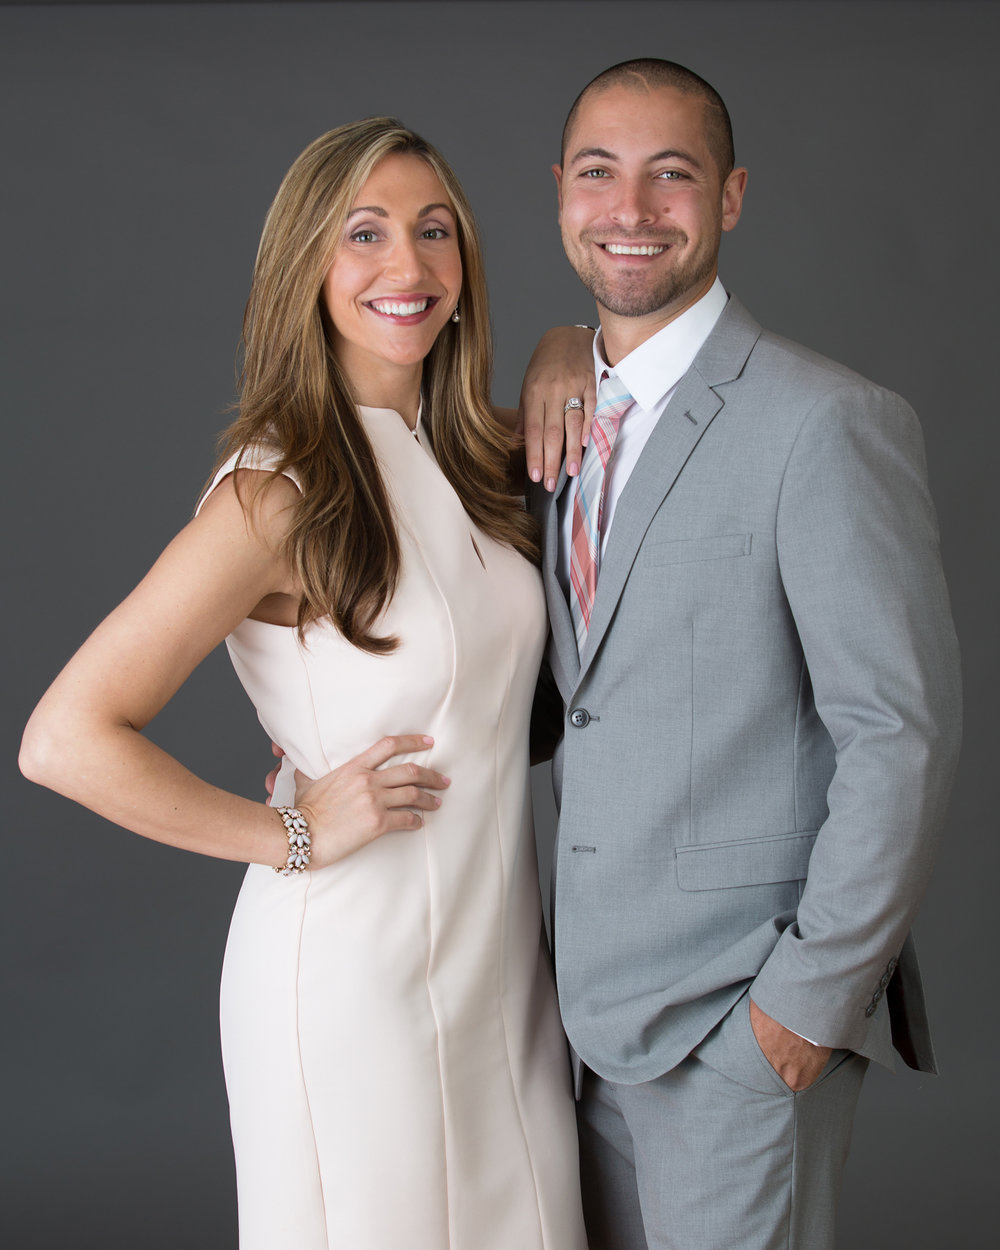 Realtor-Headshot-business-Portrait-Photographer-NY.jpg